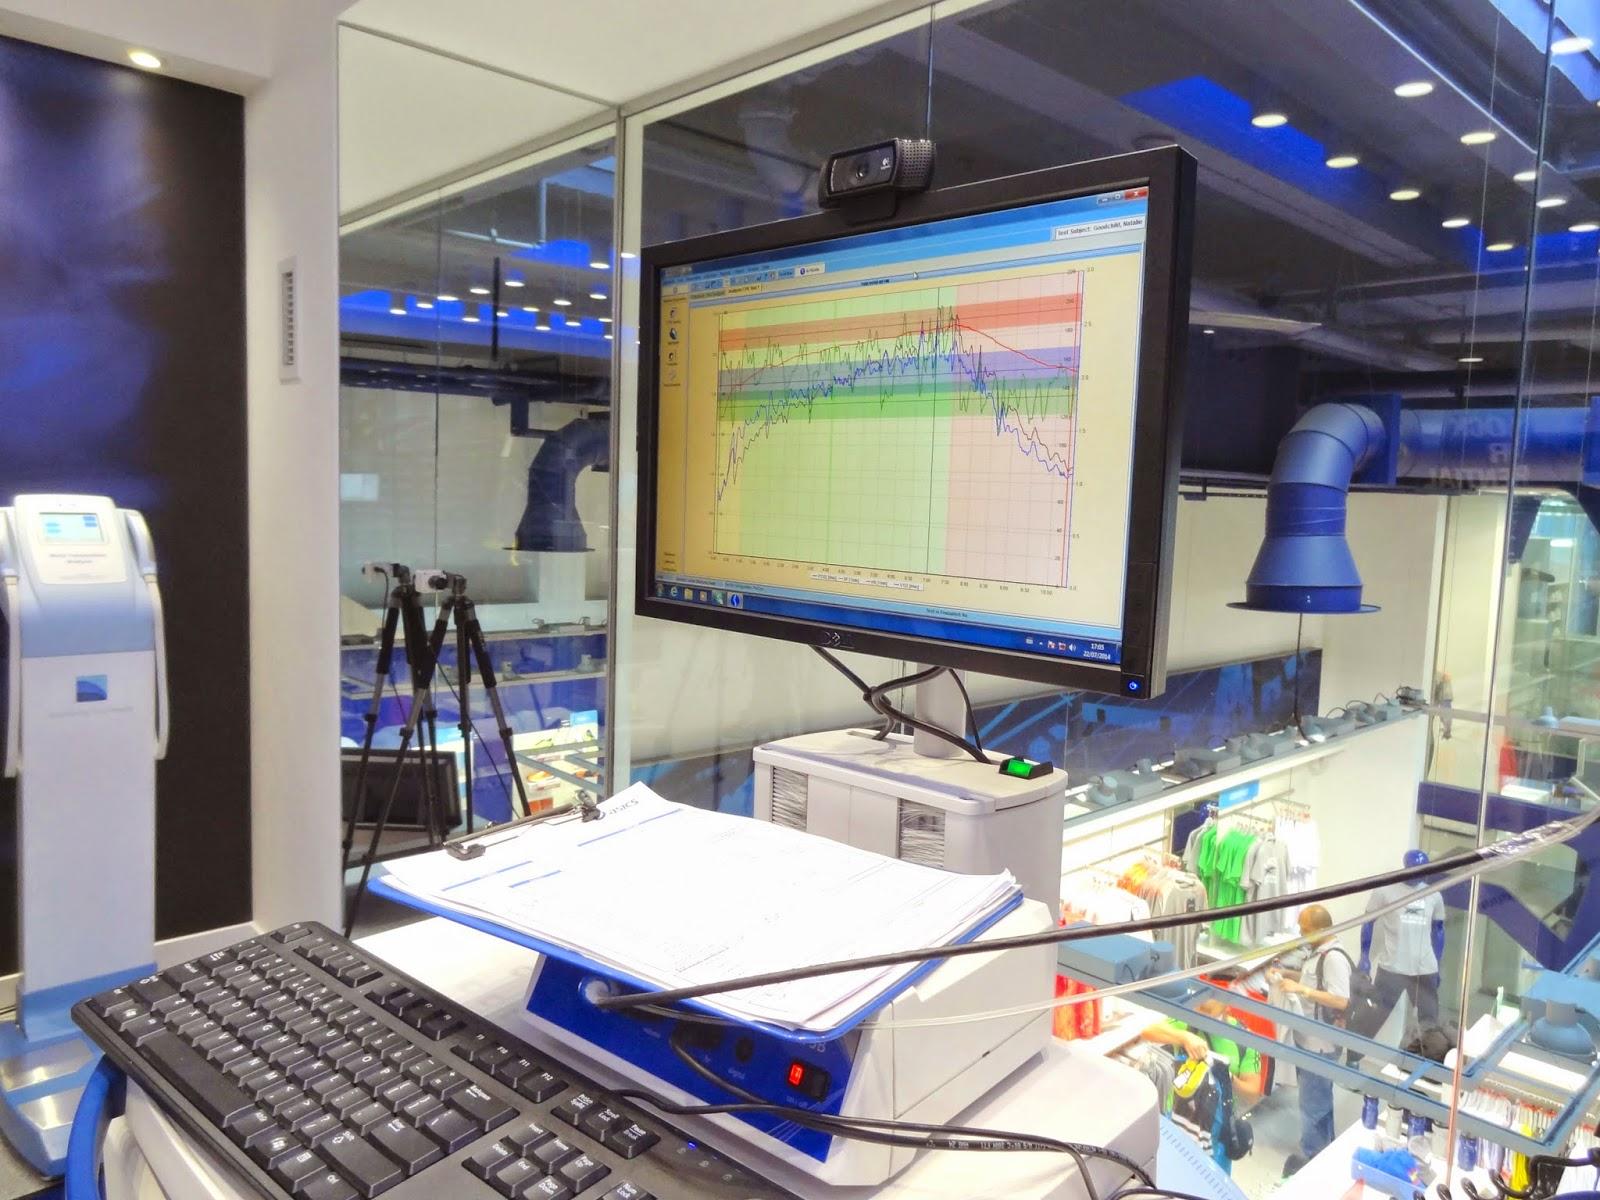 Asics Running Lab Anaerobic Threshold Testing